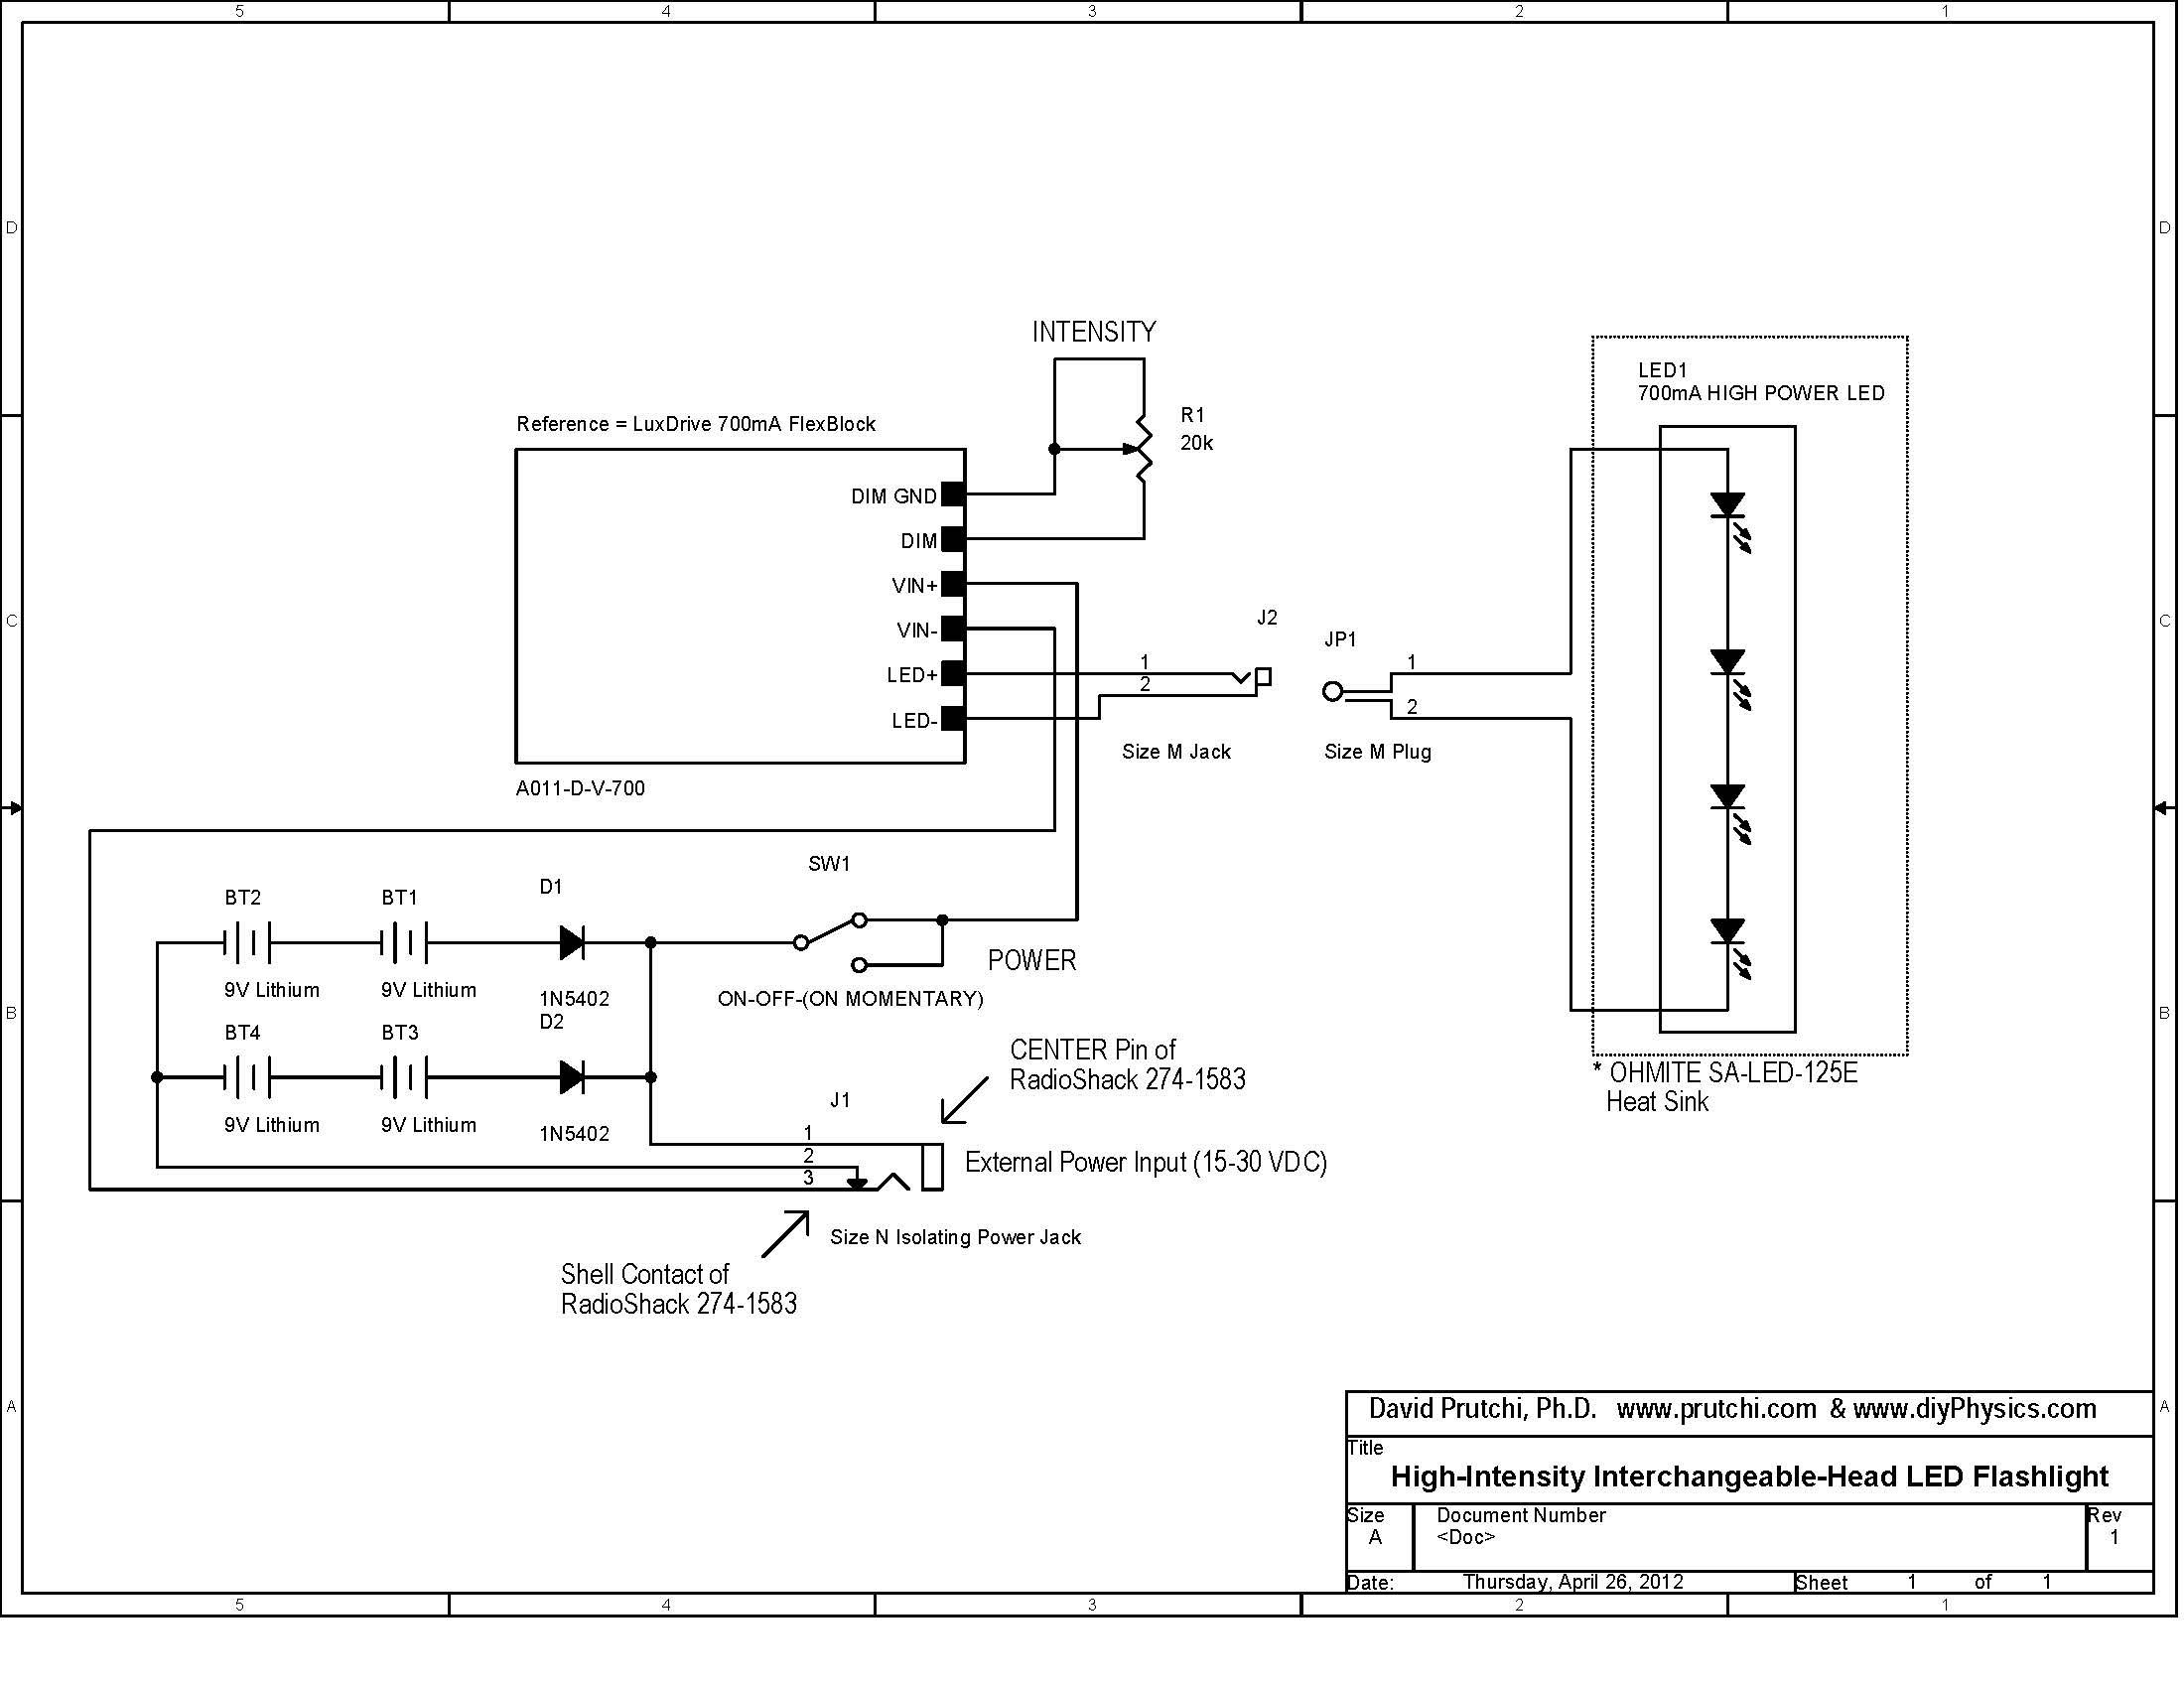 circuit diagram for high power UV/IR/visible Flashlight by David Prutchi  PhD www